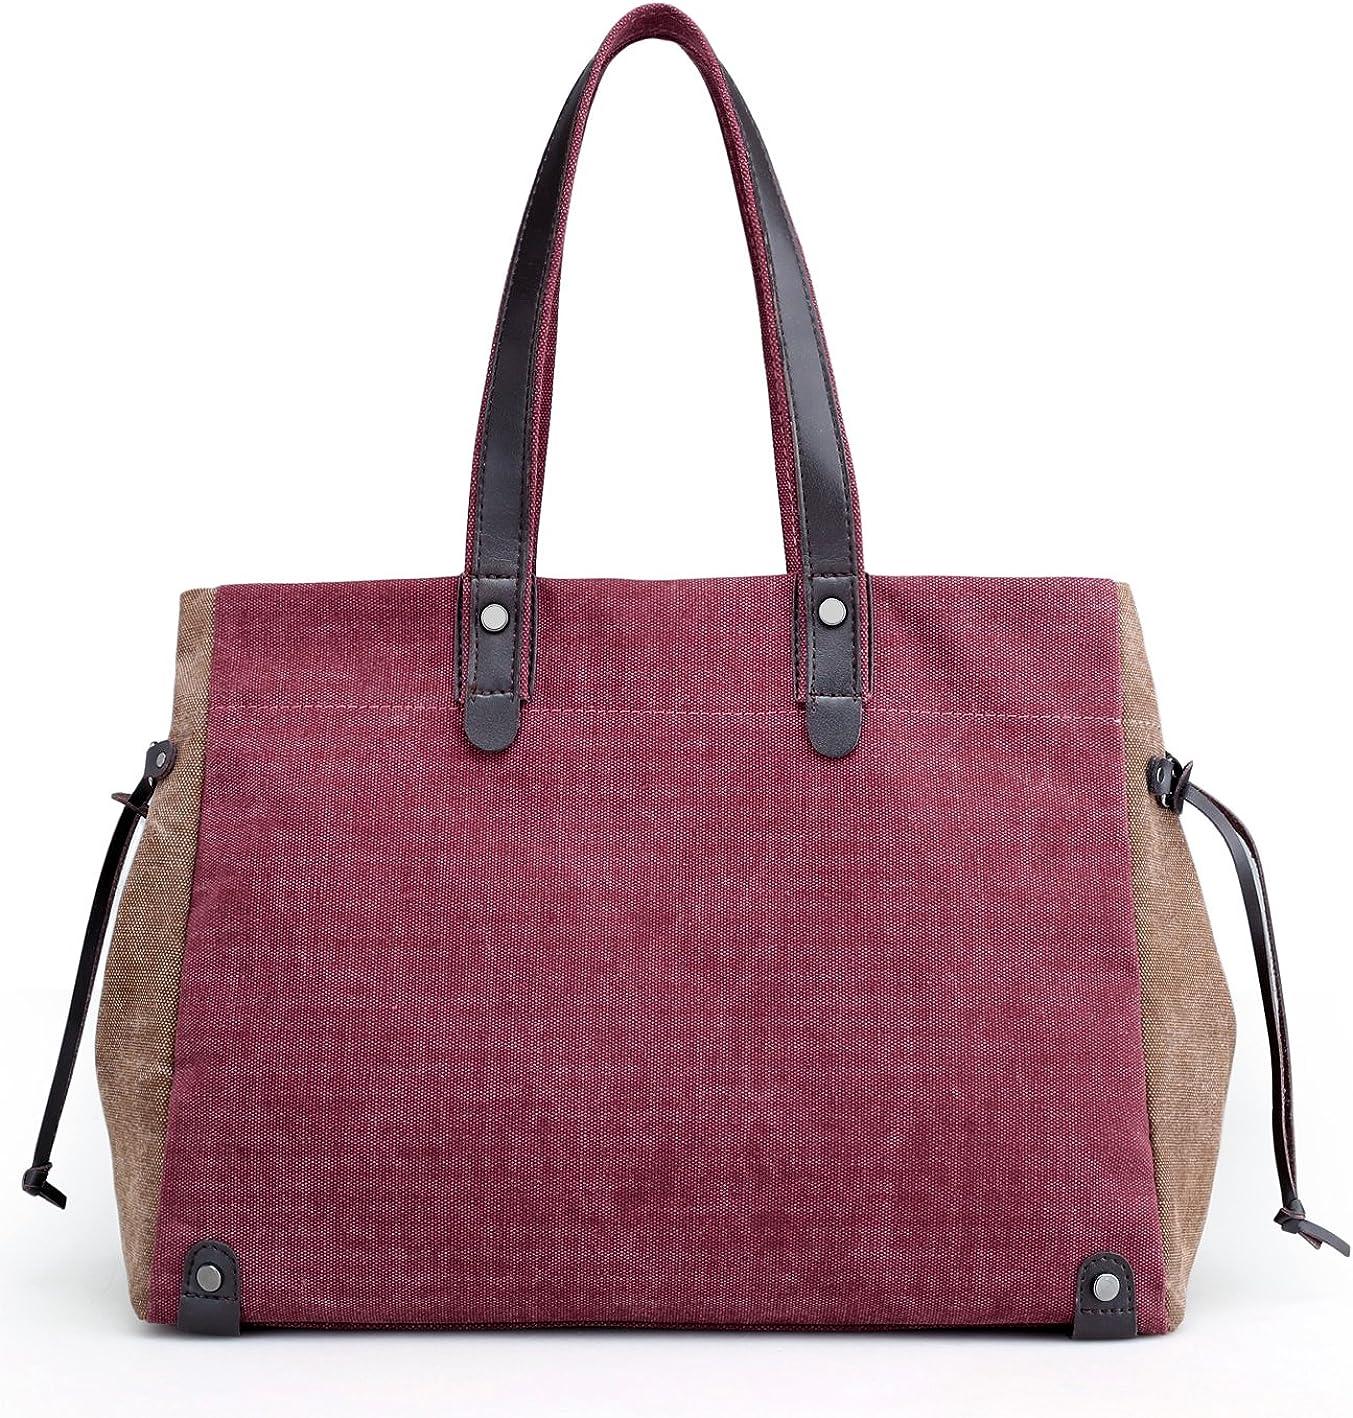 Women Handbag Shoulder Bags Top Handle Beach Tote Purse Crossbody Bag Wine Red